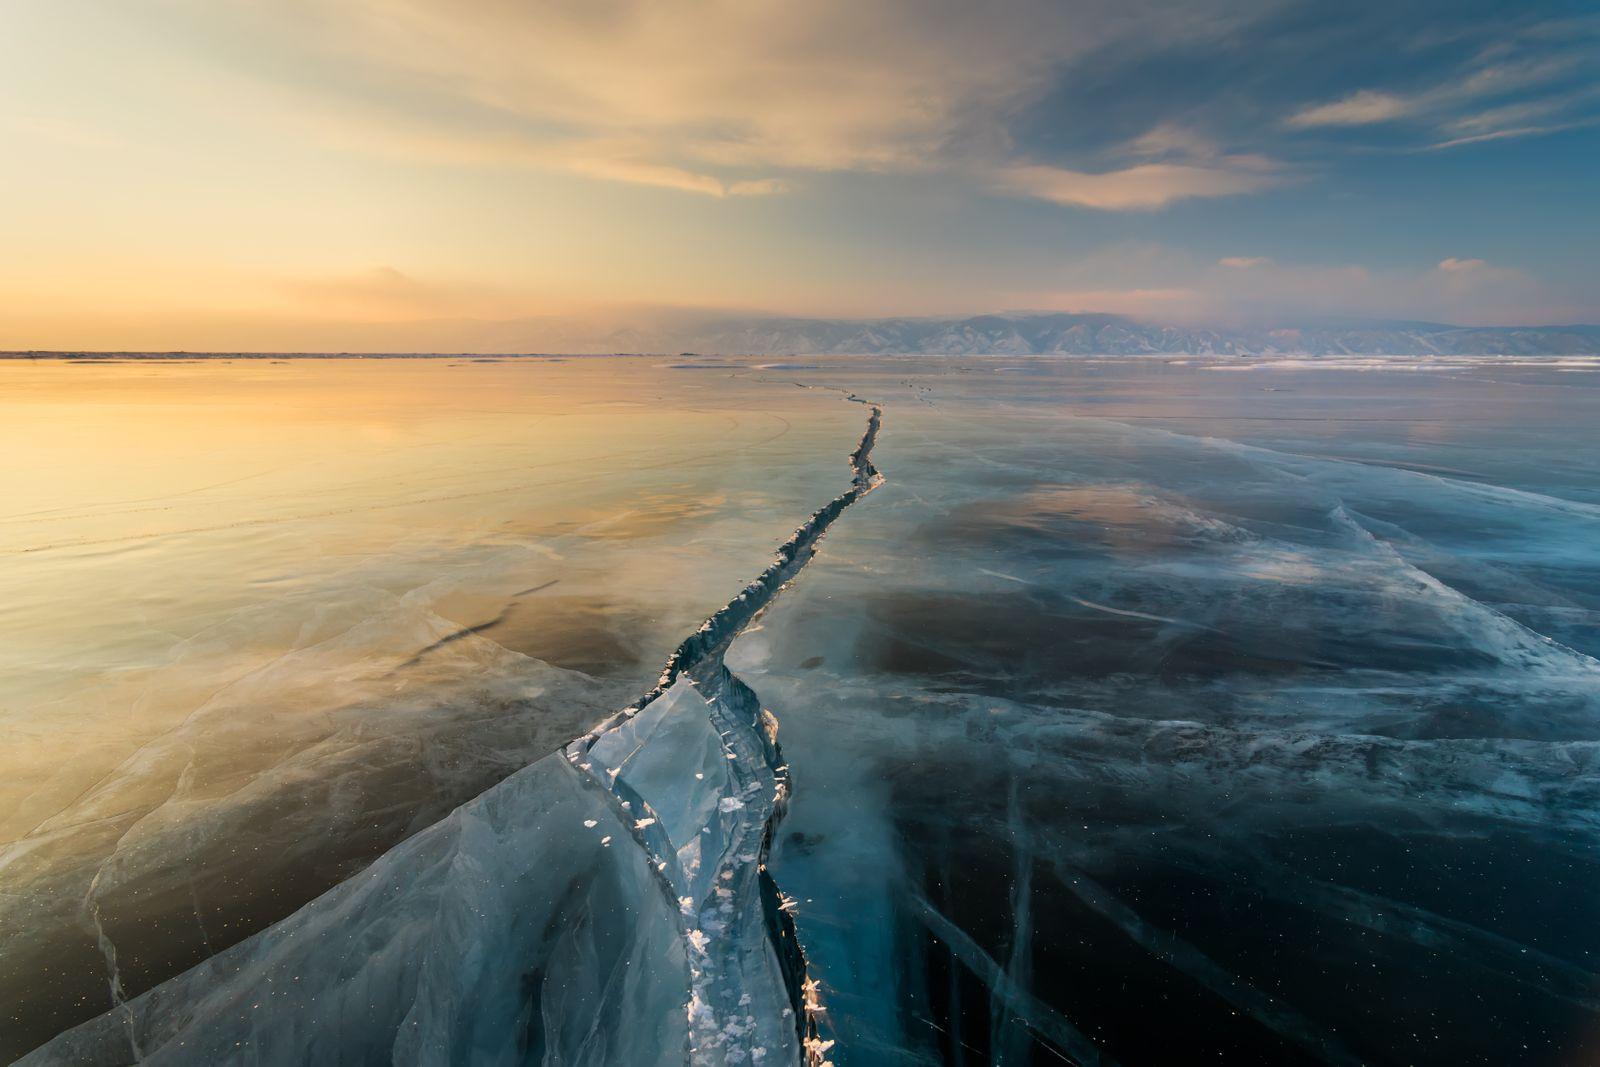 Sunset on the ice with cracks. Baikal, winter